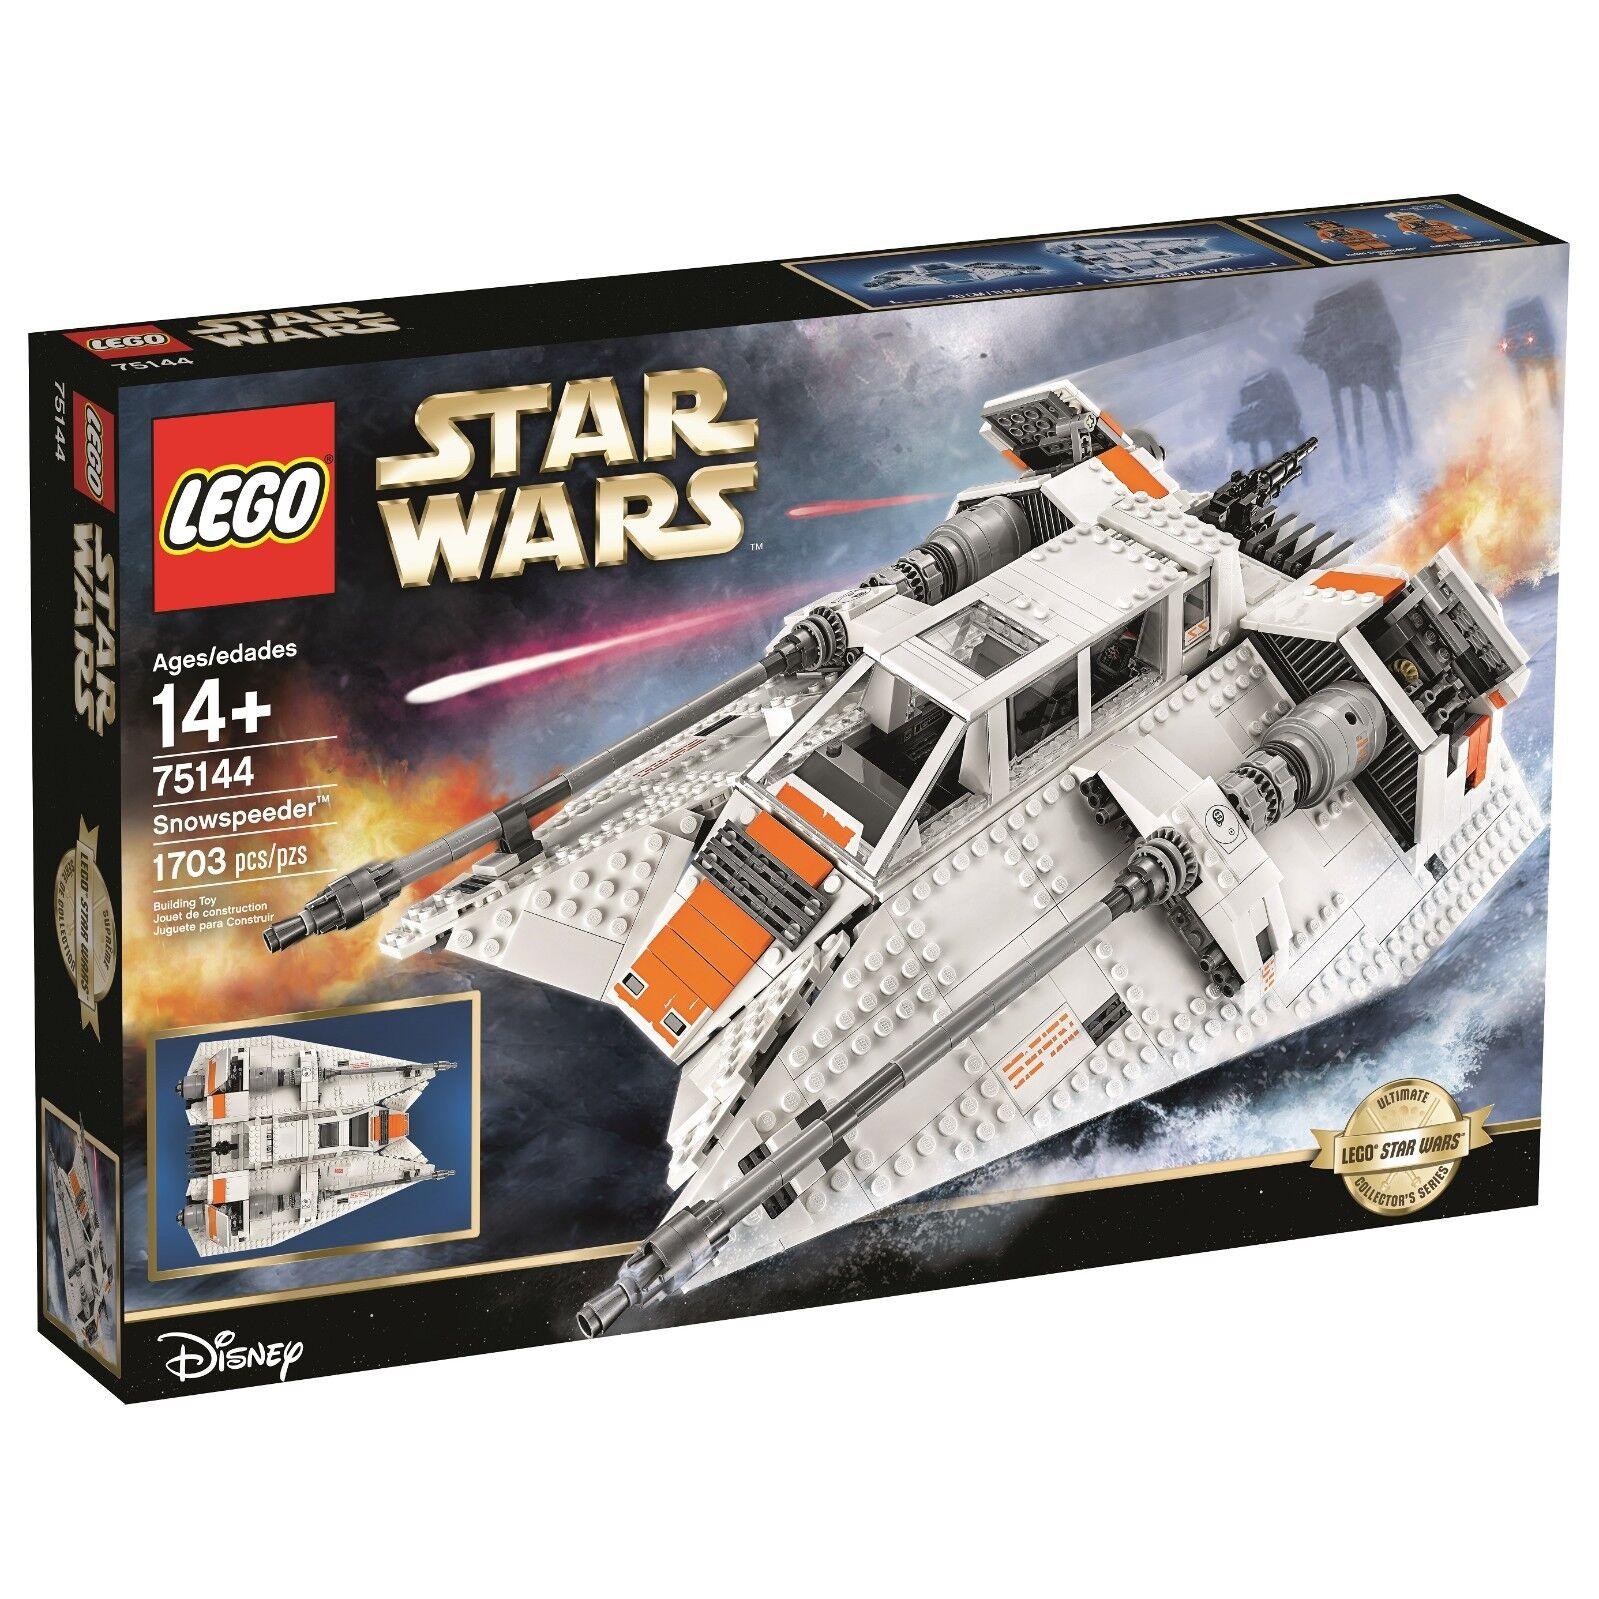 LEGO Star Star Star Wars 75144 Snowspeeder - UCS Exclusive WORLDWIDE SHIPPING e25d44